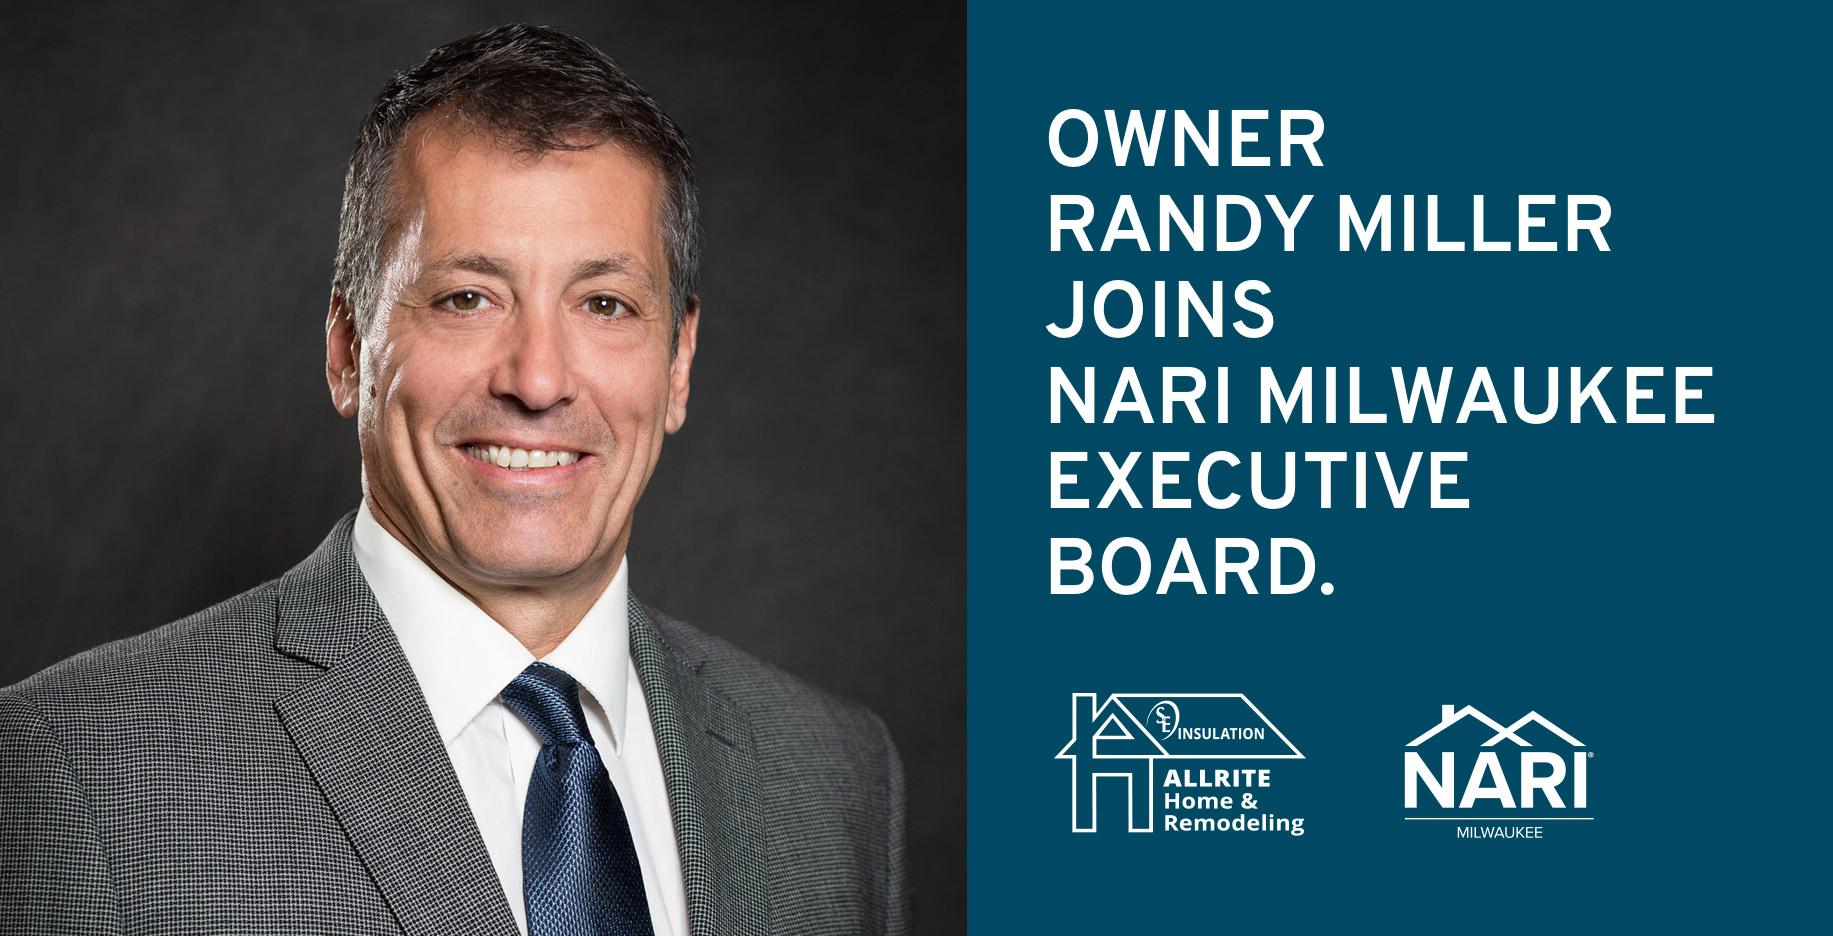 Randy Miller, Owner of Allrite Home & Remodeling joins NARI Milwaukee Executive Board, serving as Treasurer.